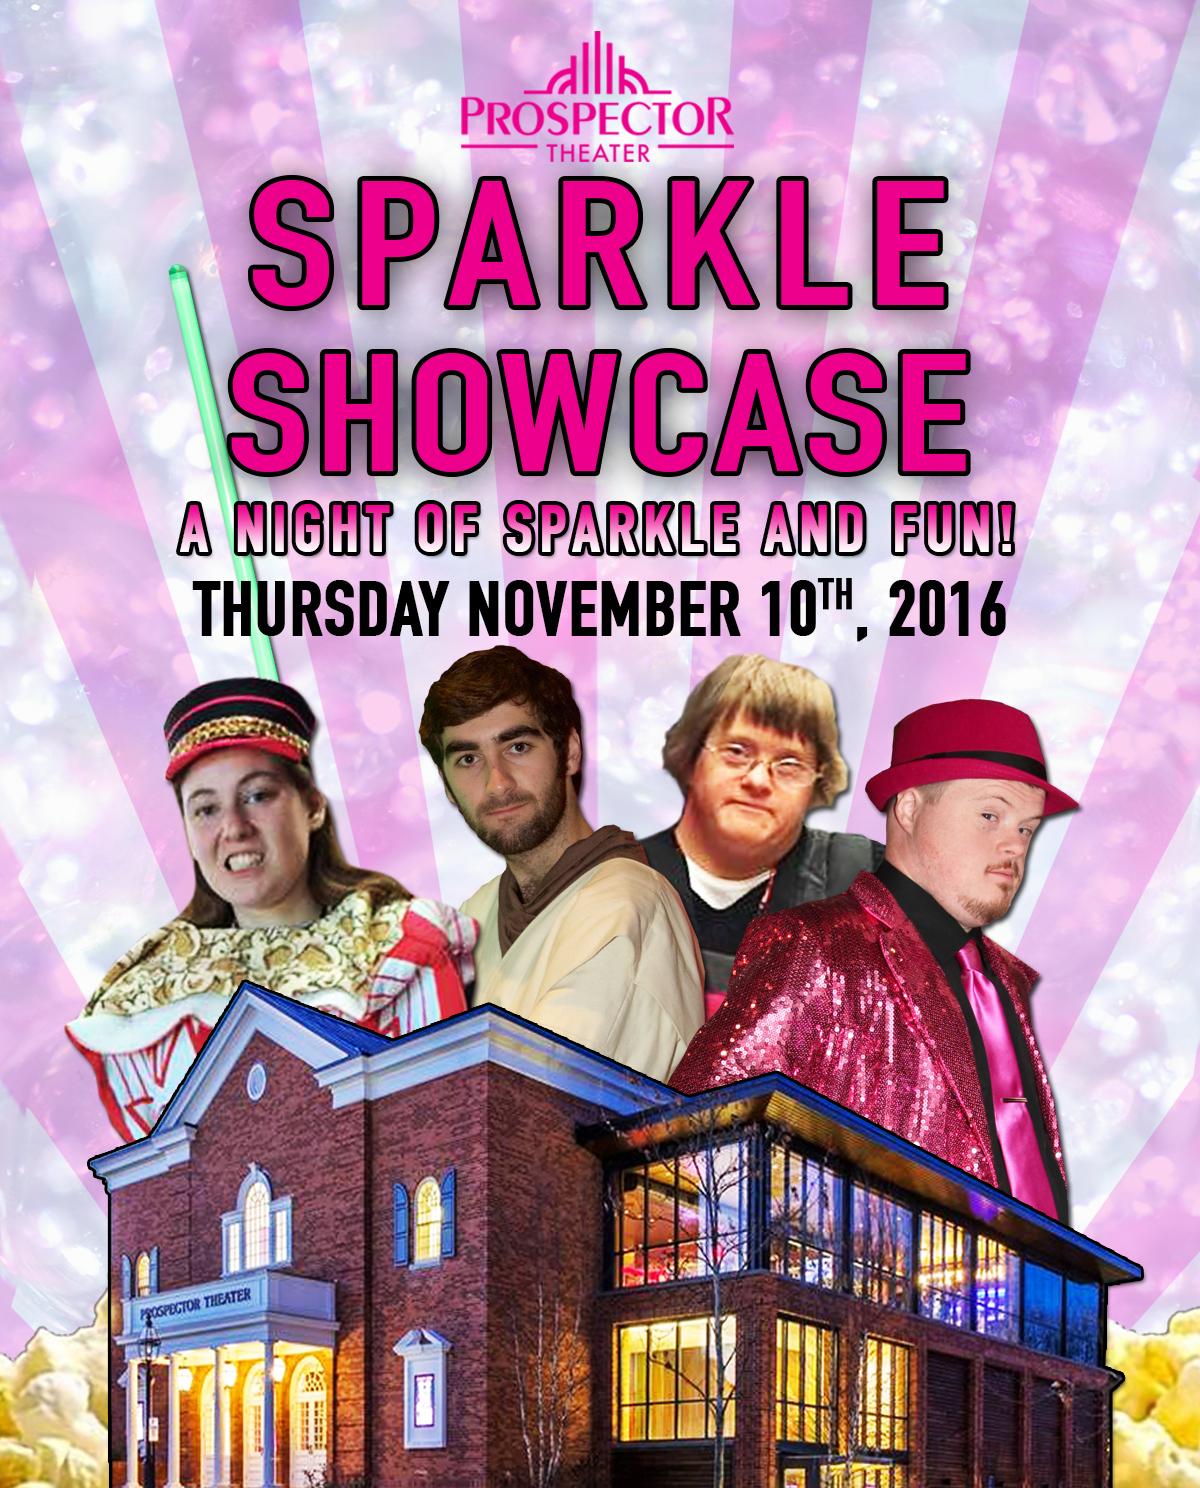 sparkle_showcase_postcard.jpg